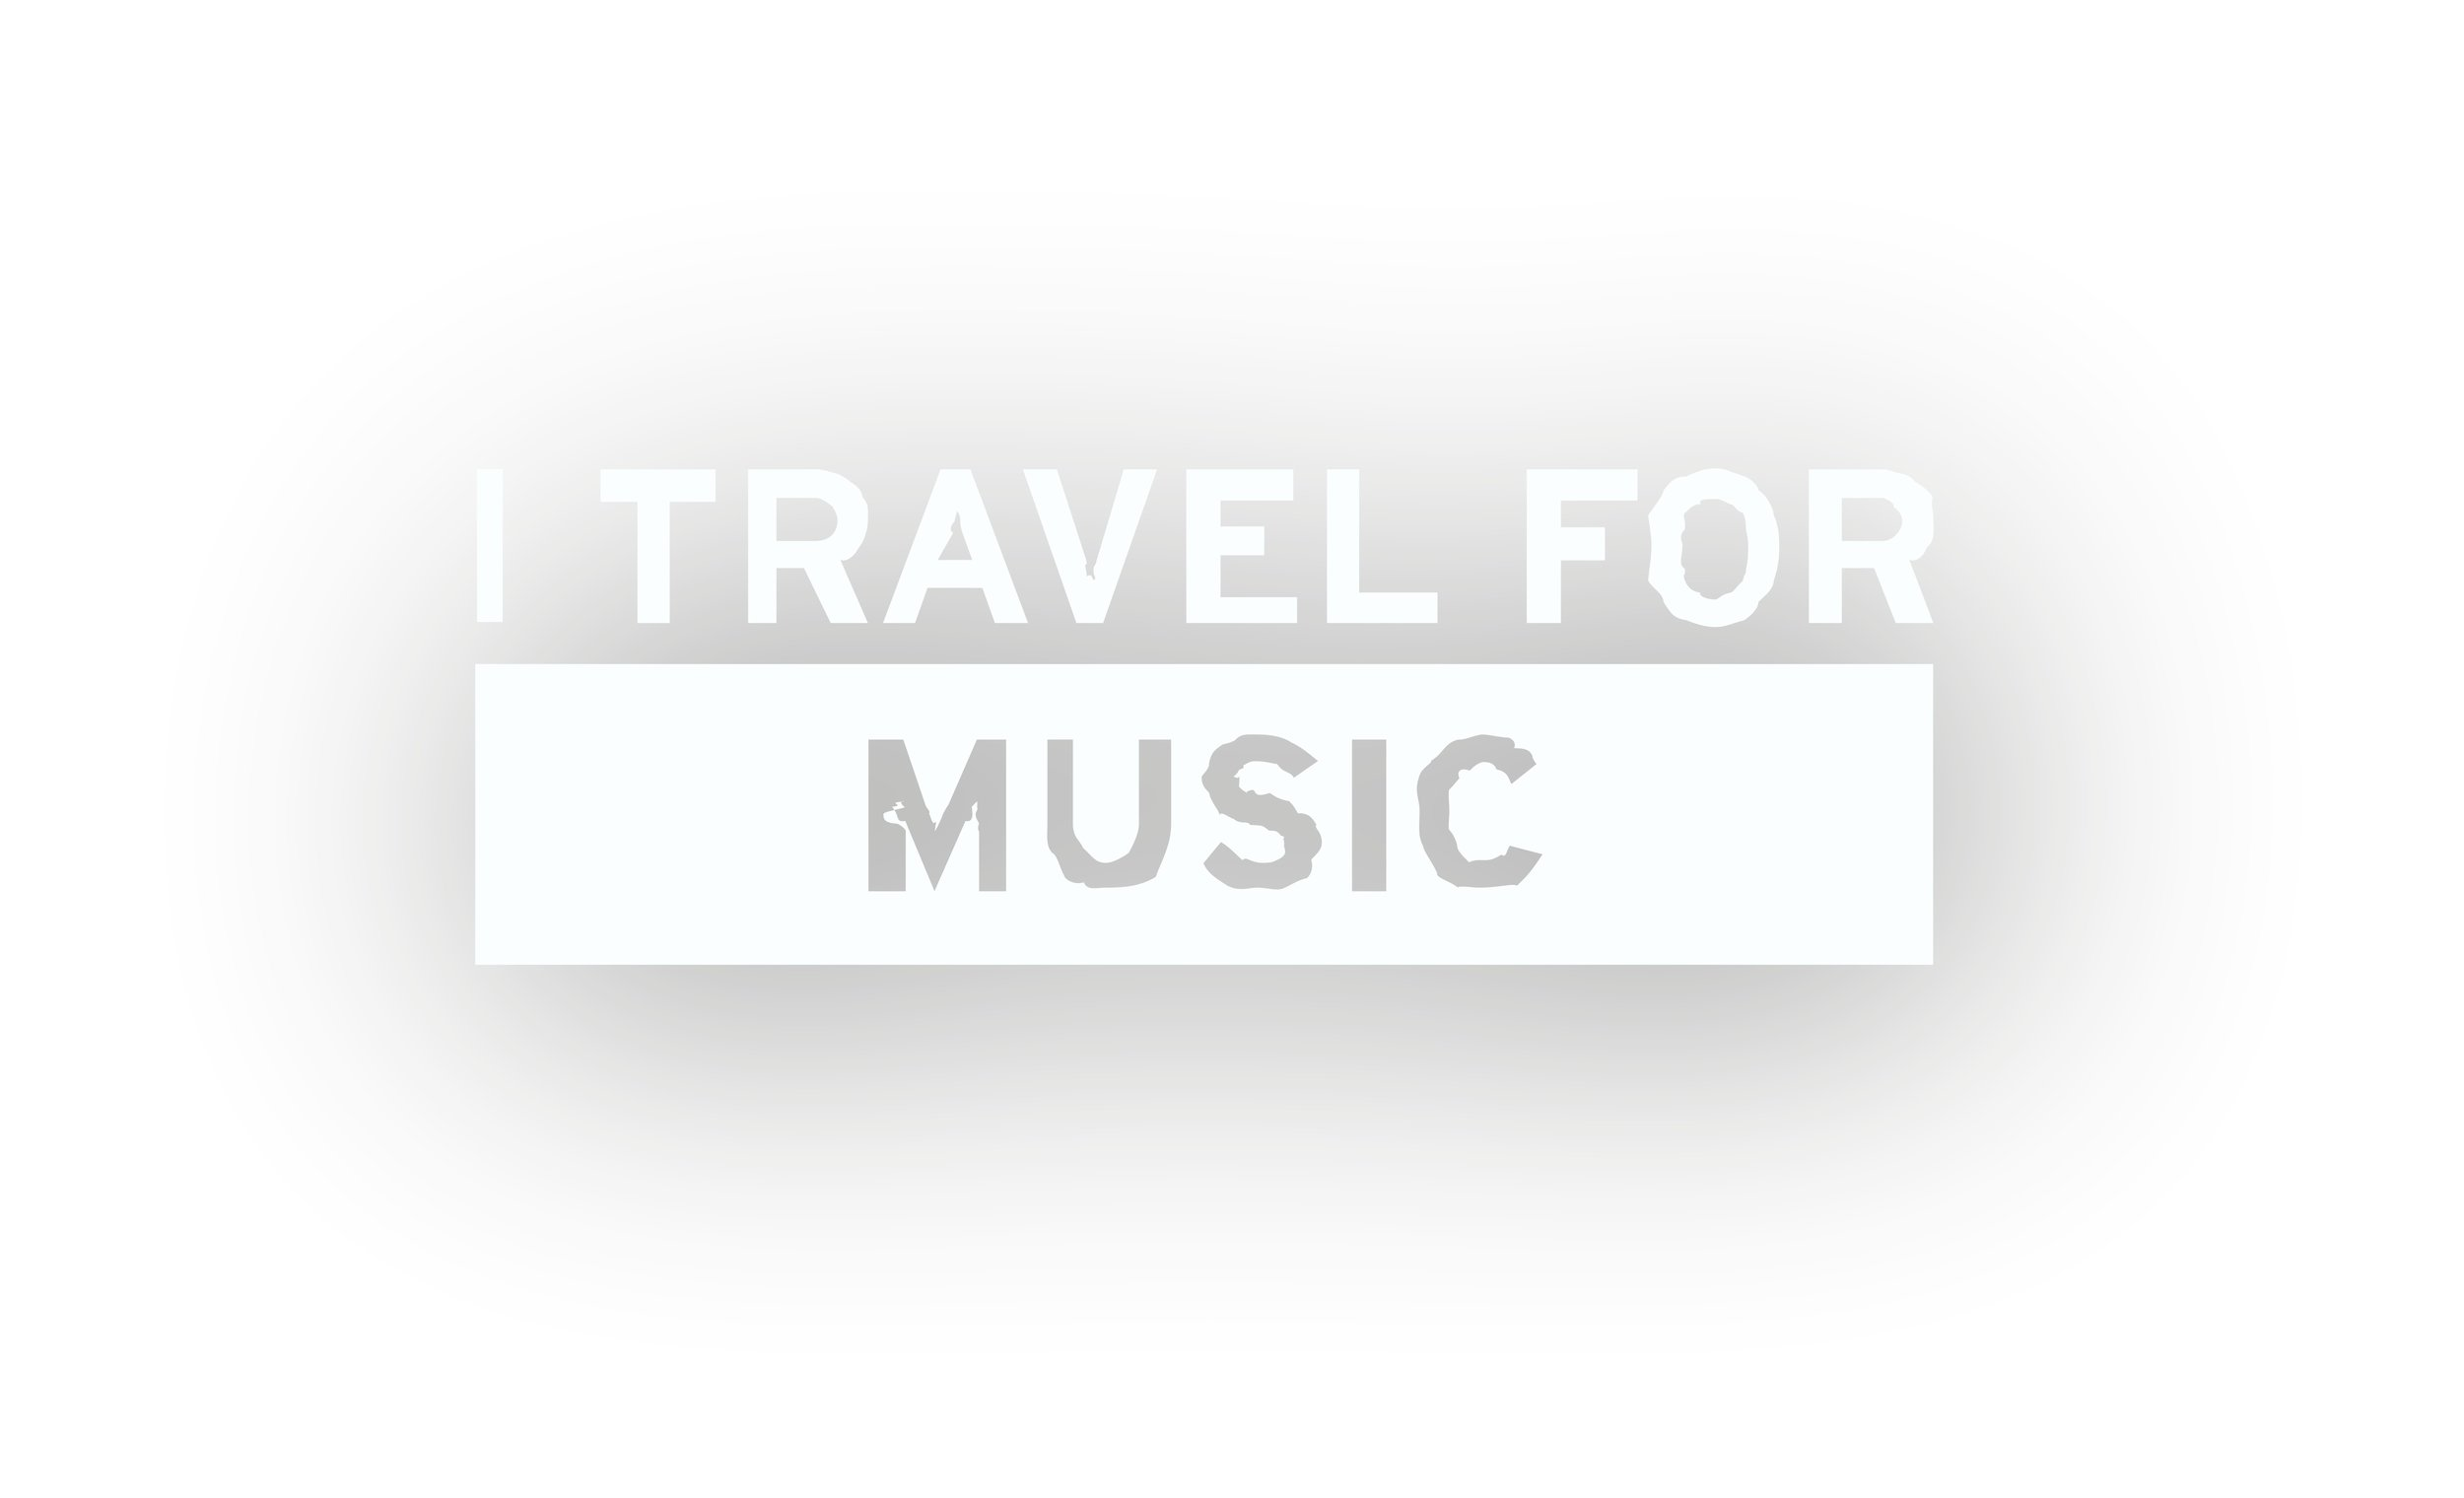 I TRAVEL FOR MUSIC_WHITE_WS_ENGLISH (1).jpg